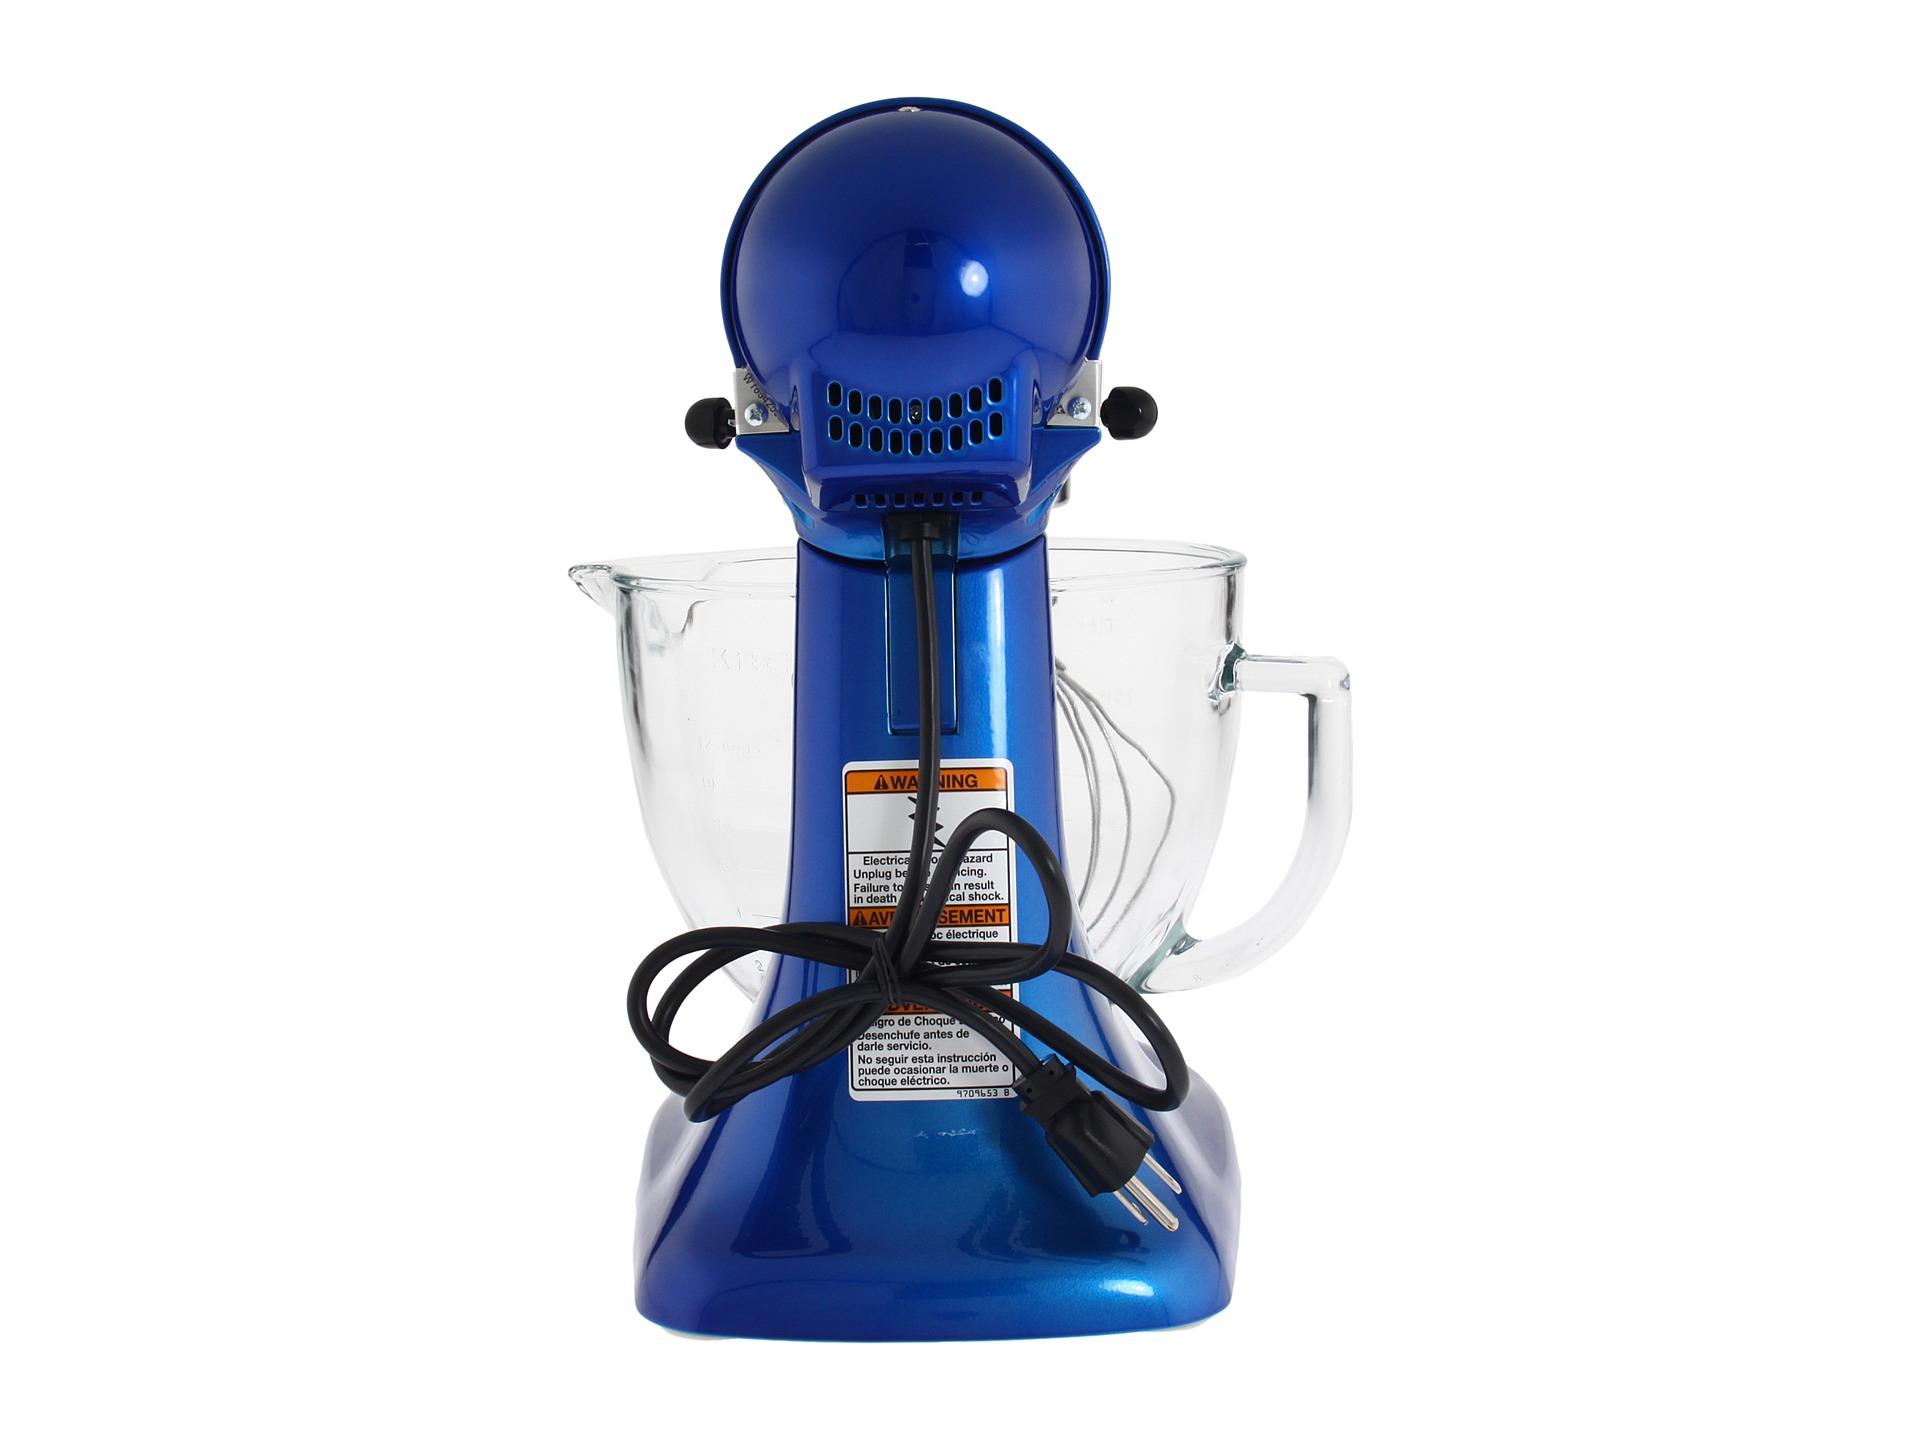 Kitchenaid 5 quart tilt head artisan design series stand mixer shipped free at zappos - Kitchenaid artisan qt stand mixer sale ...